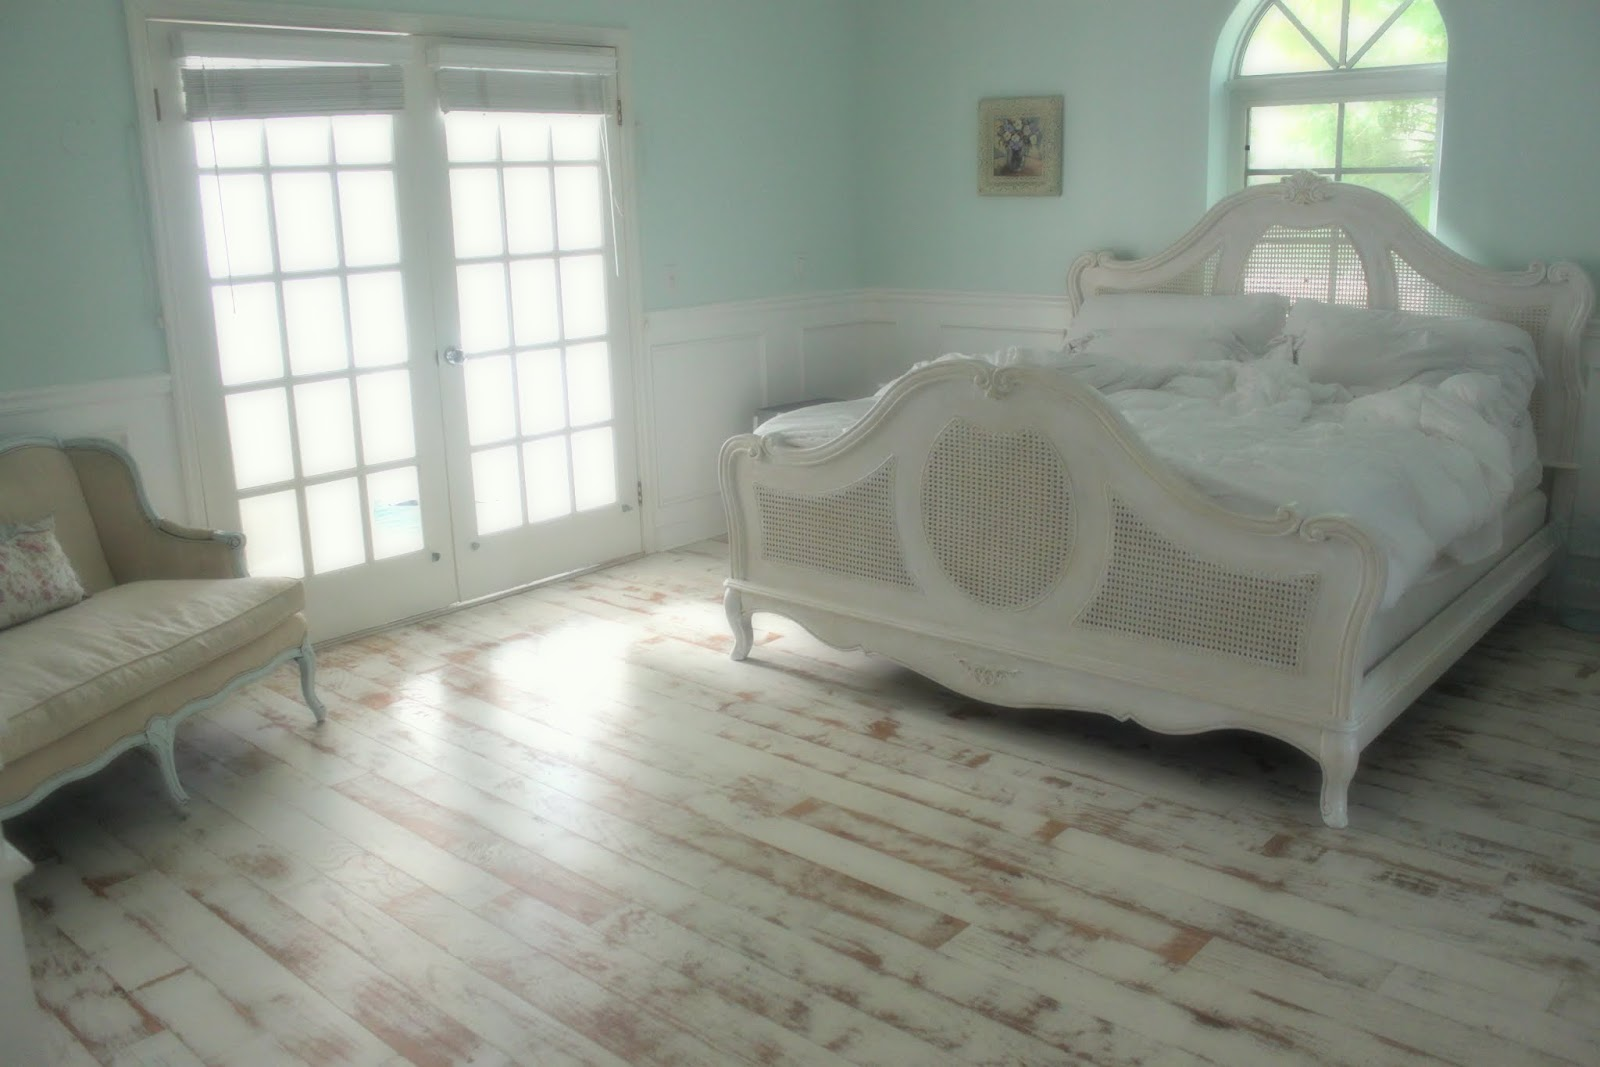 Create Floor Plans Online Hardwood Floors Painted Distressed Gray Ask Home Design